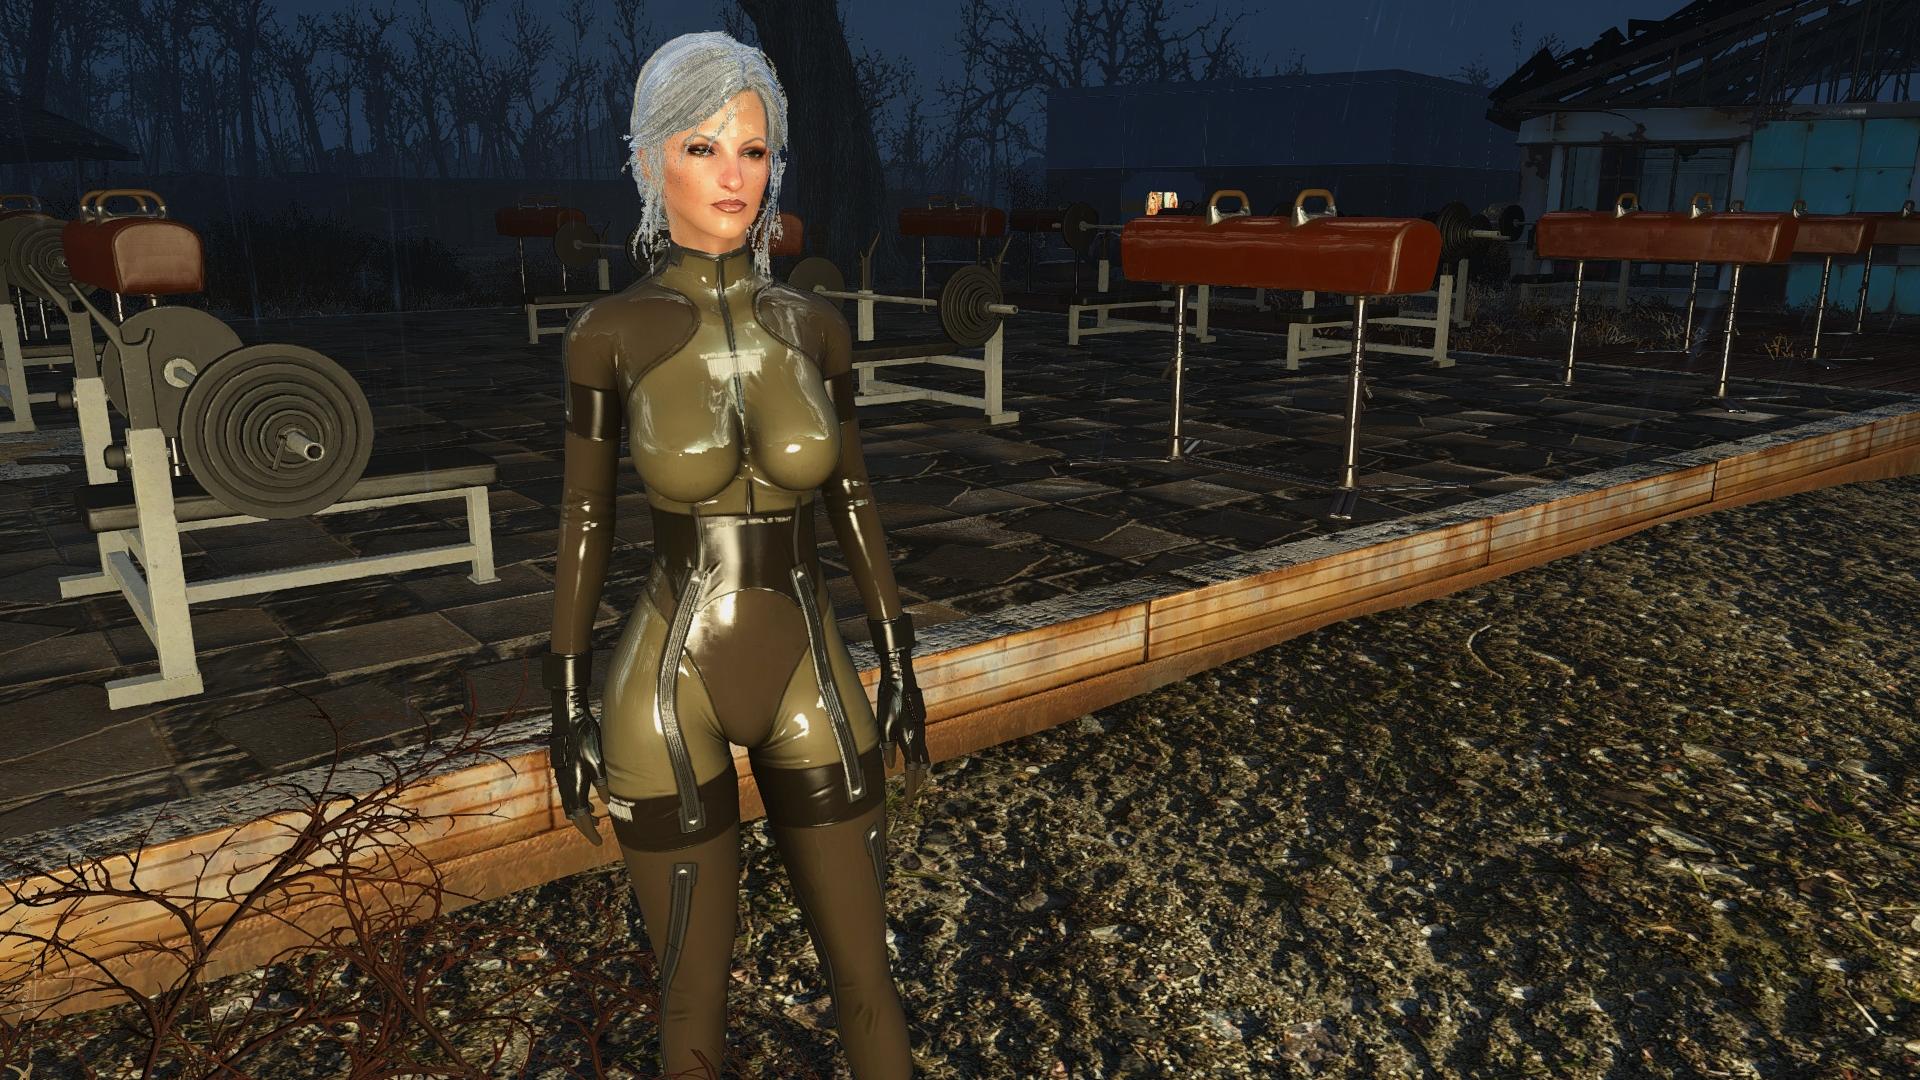 000200.Jpg - Fallout 4